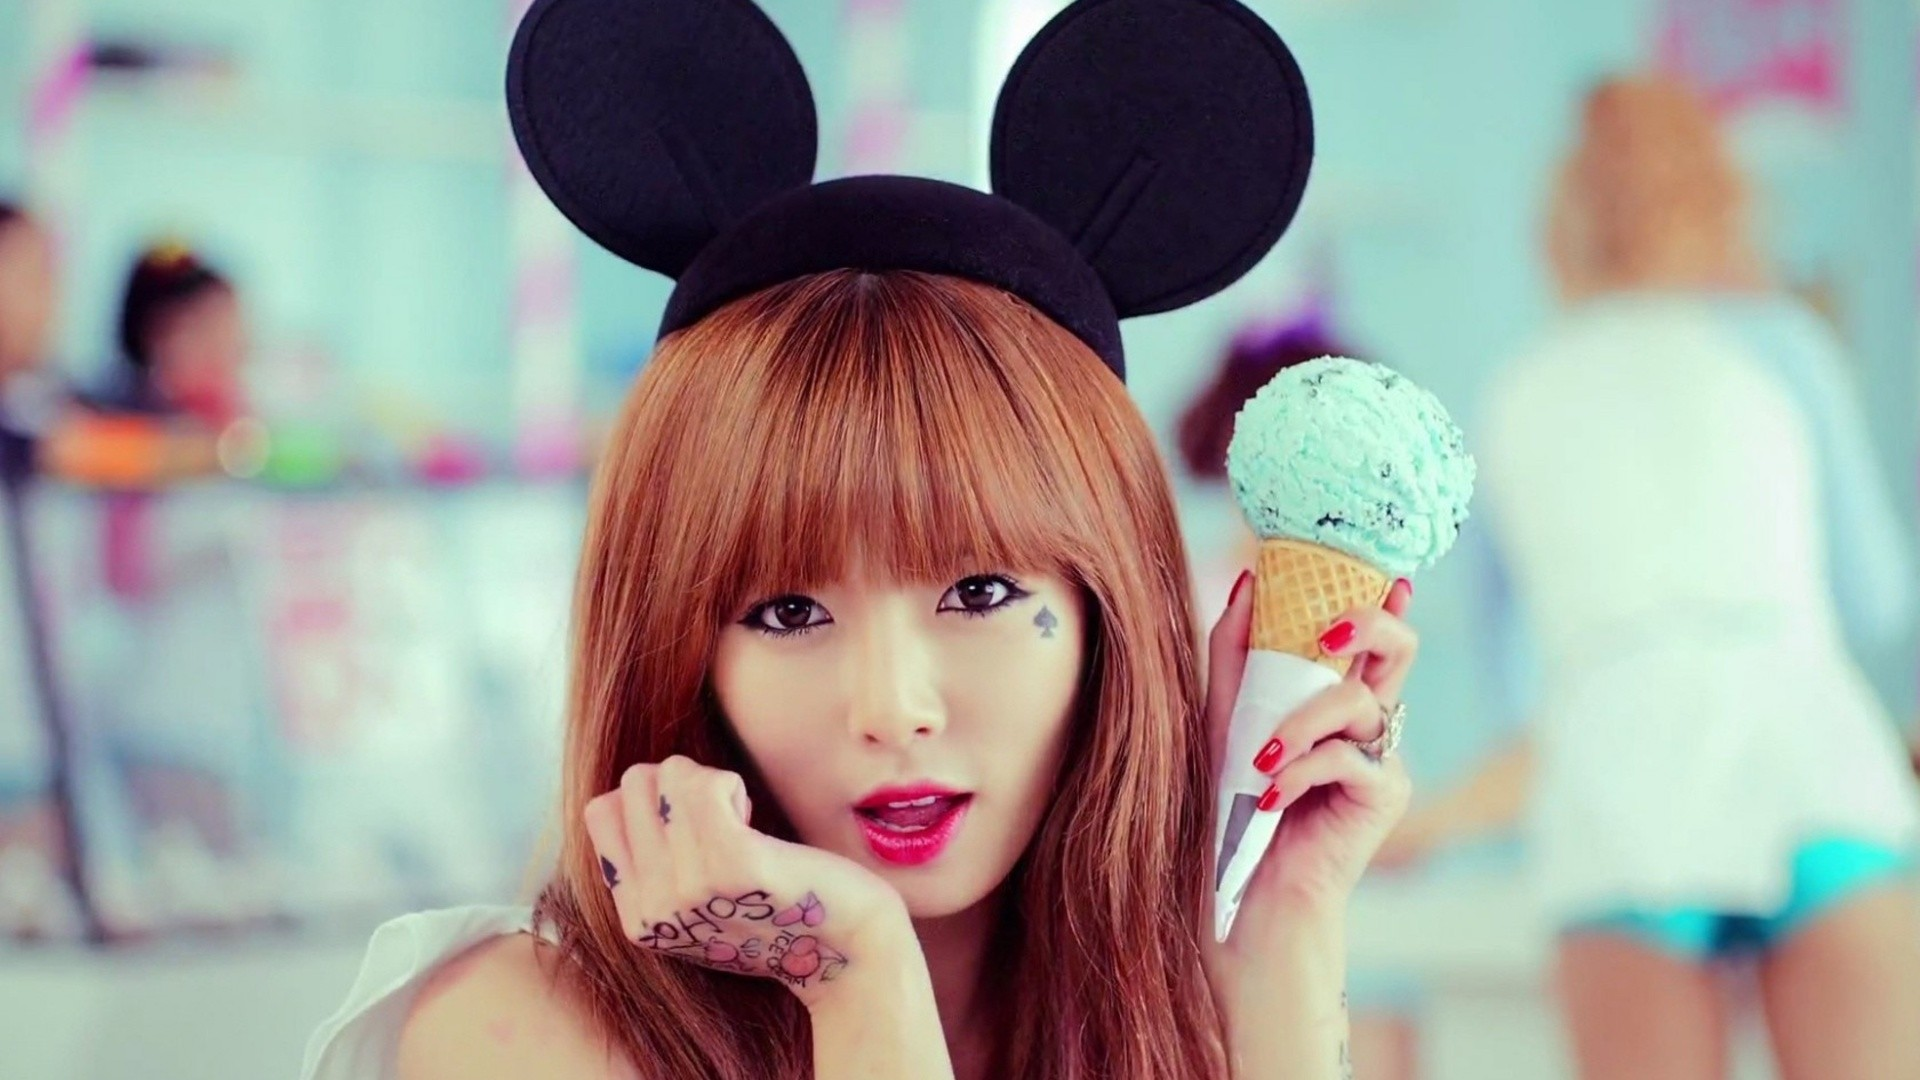 Hyuna HD Wallpaper #34557 - Asiachan KPOP Image Board  Hyuna HD Wallpa...